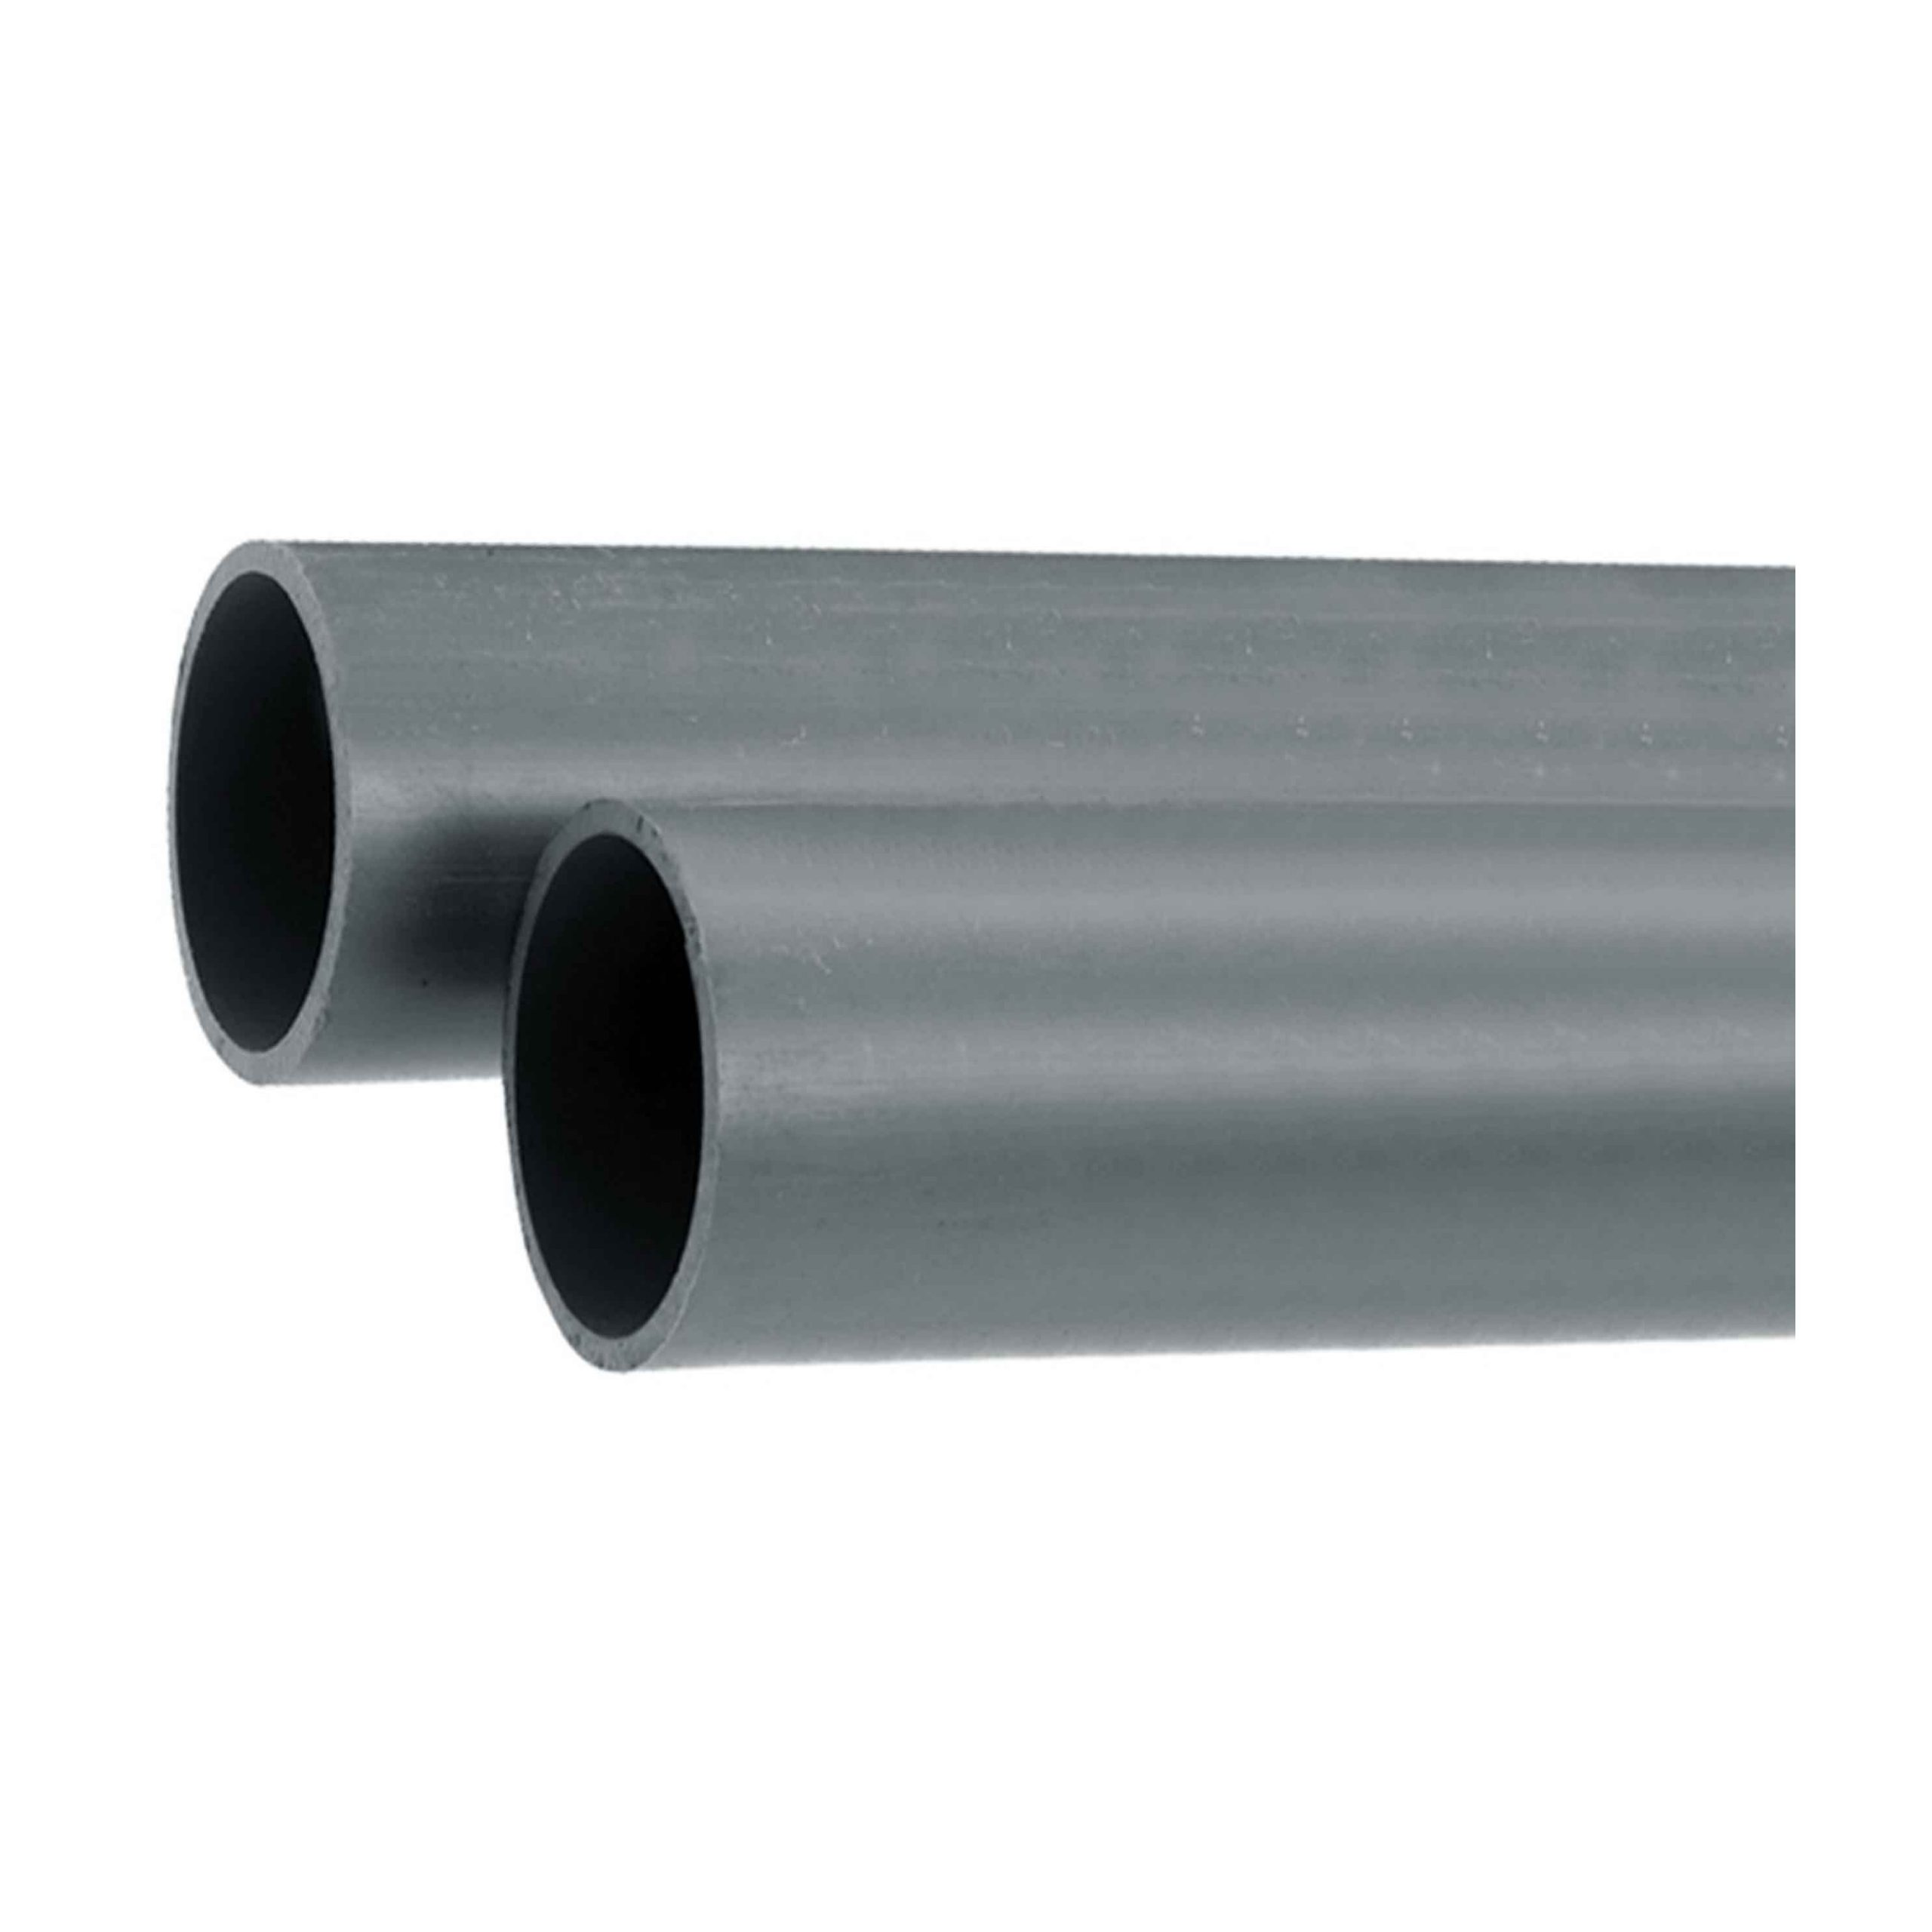 TUBE_PVC_VENTILATION_REF_5803_SEMI_RIGIDE_BSB_CAOUTCHOUCS_PLASTIQUES